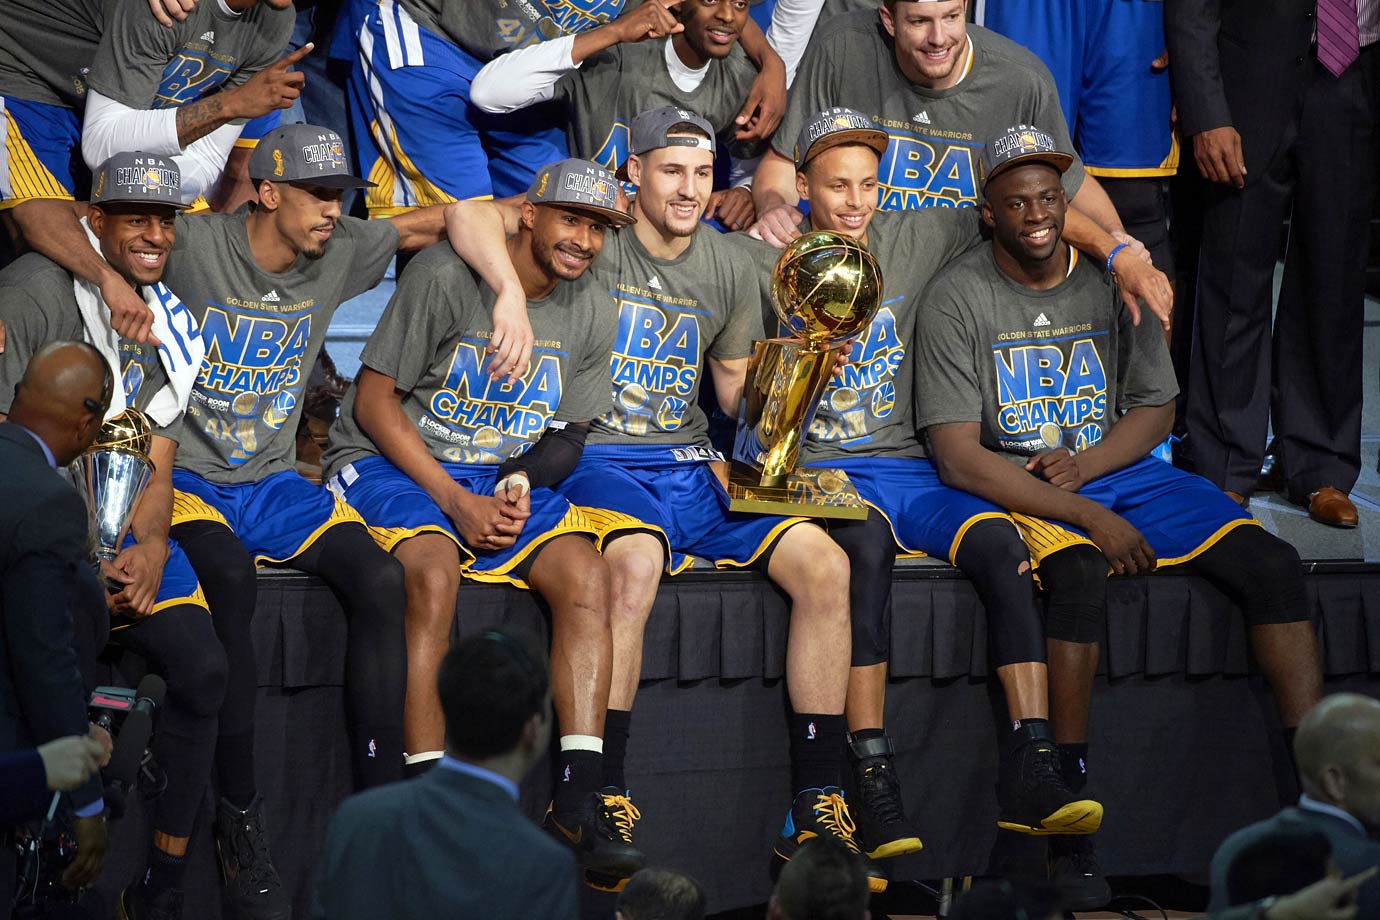 June 16, 2015 — NBA Finals Game 6 — Golden State Warriors vs. Cleveland Cavaliers